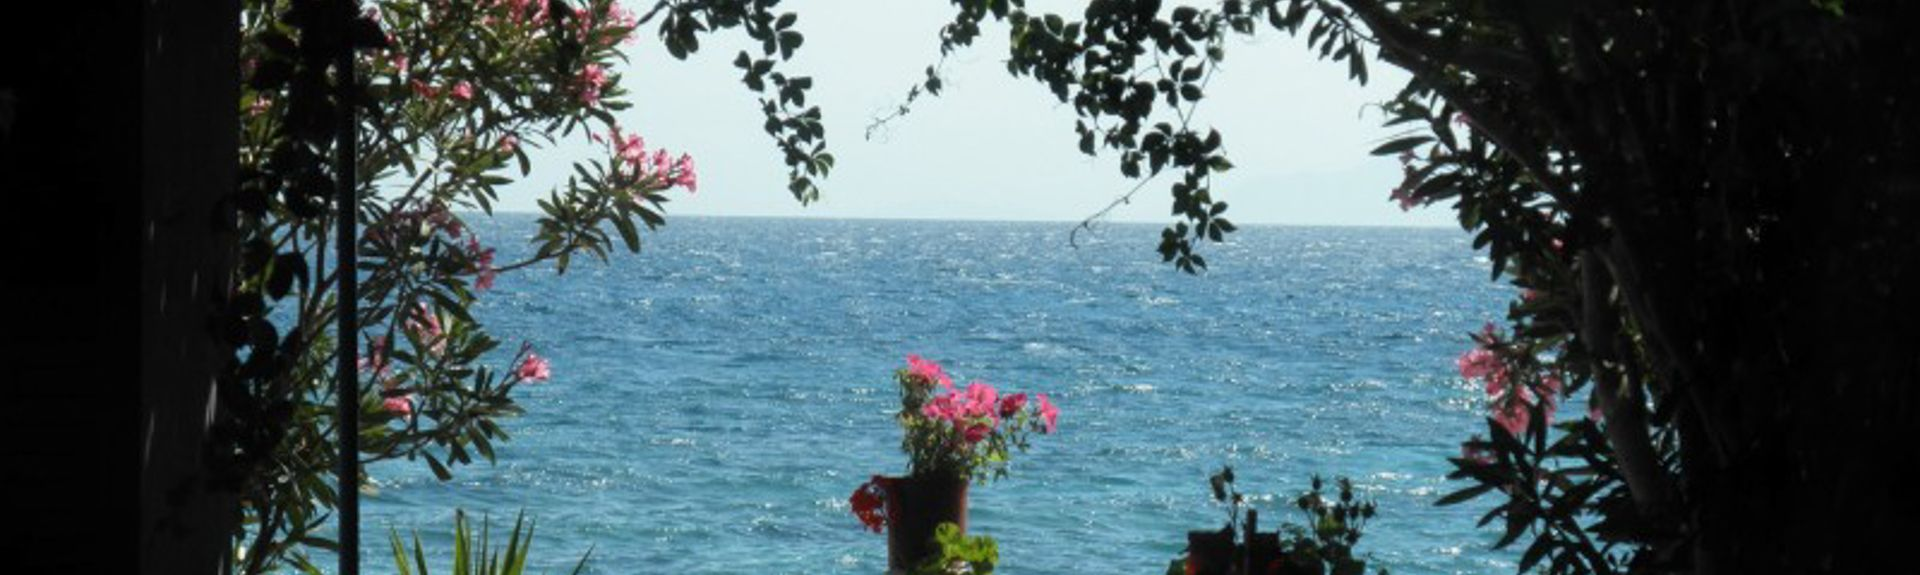 Sami, Kefalonia, Ionian Islands Region, Greece